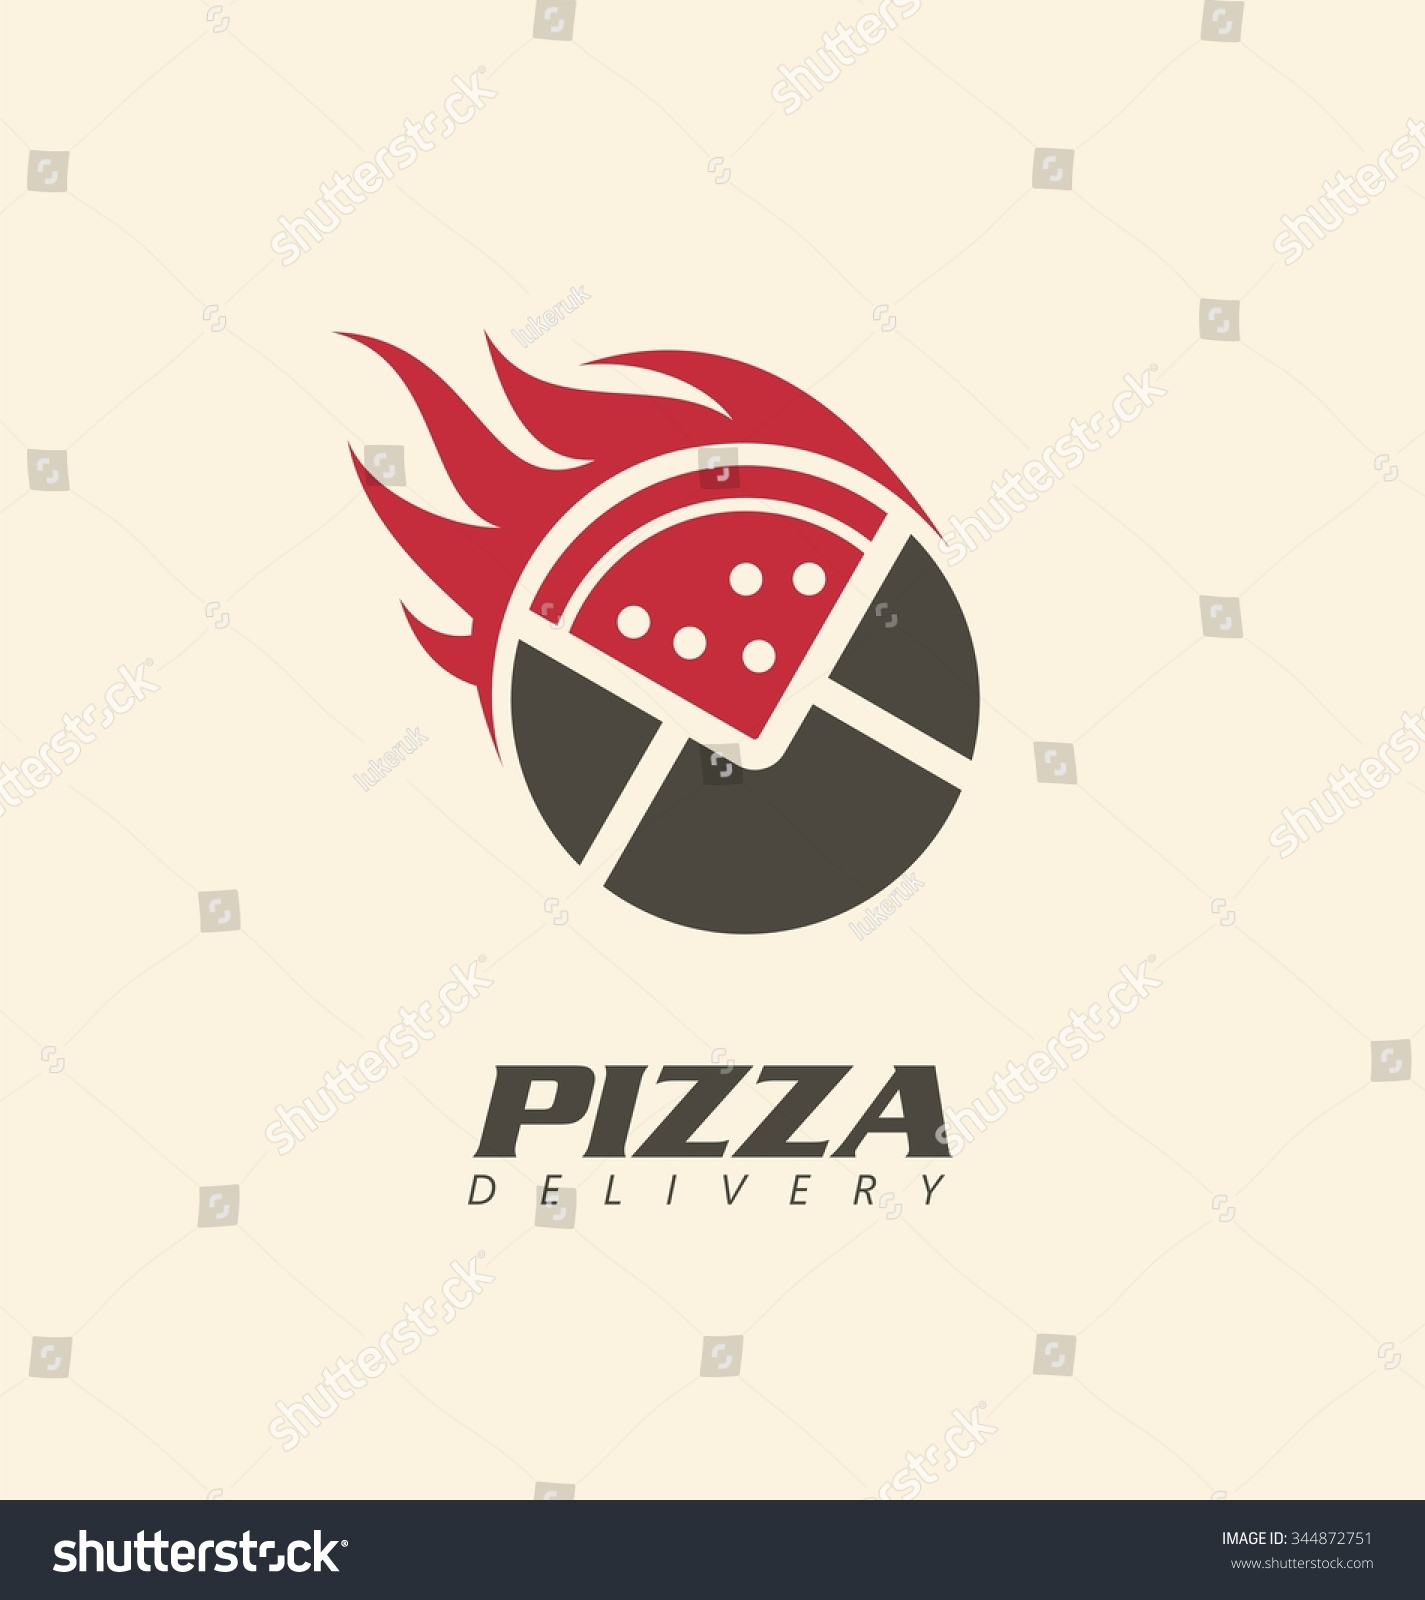 creative symbol concept pizza delivery logo stock vector